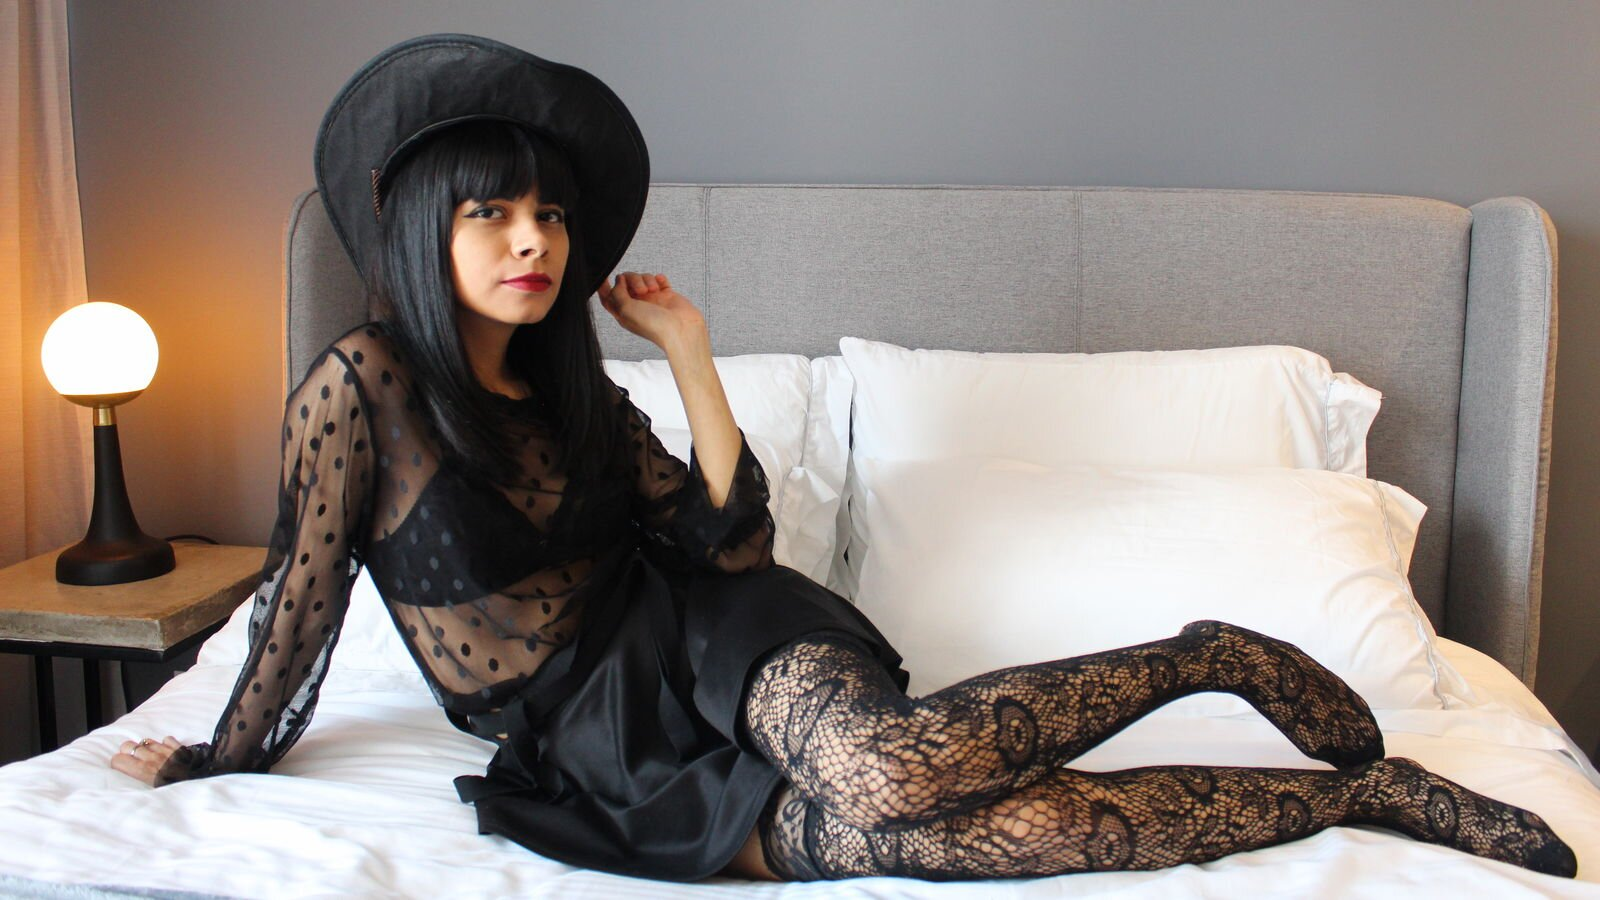 Veronica616